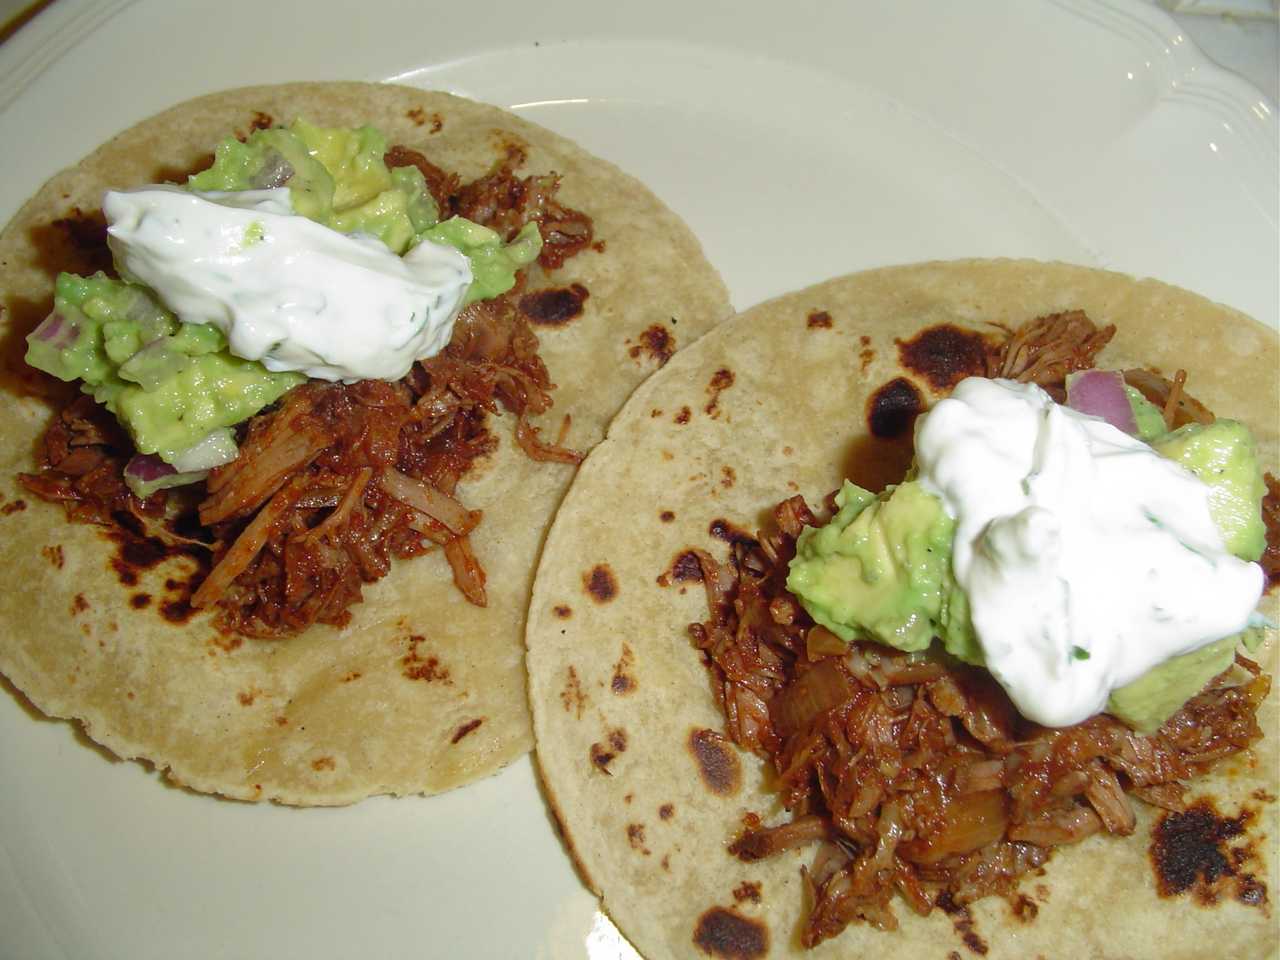 A Girl's Gotta Eat: Smoky Shredded Beef Tacos